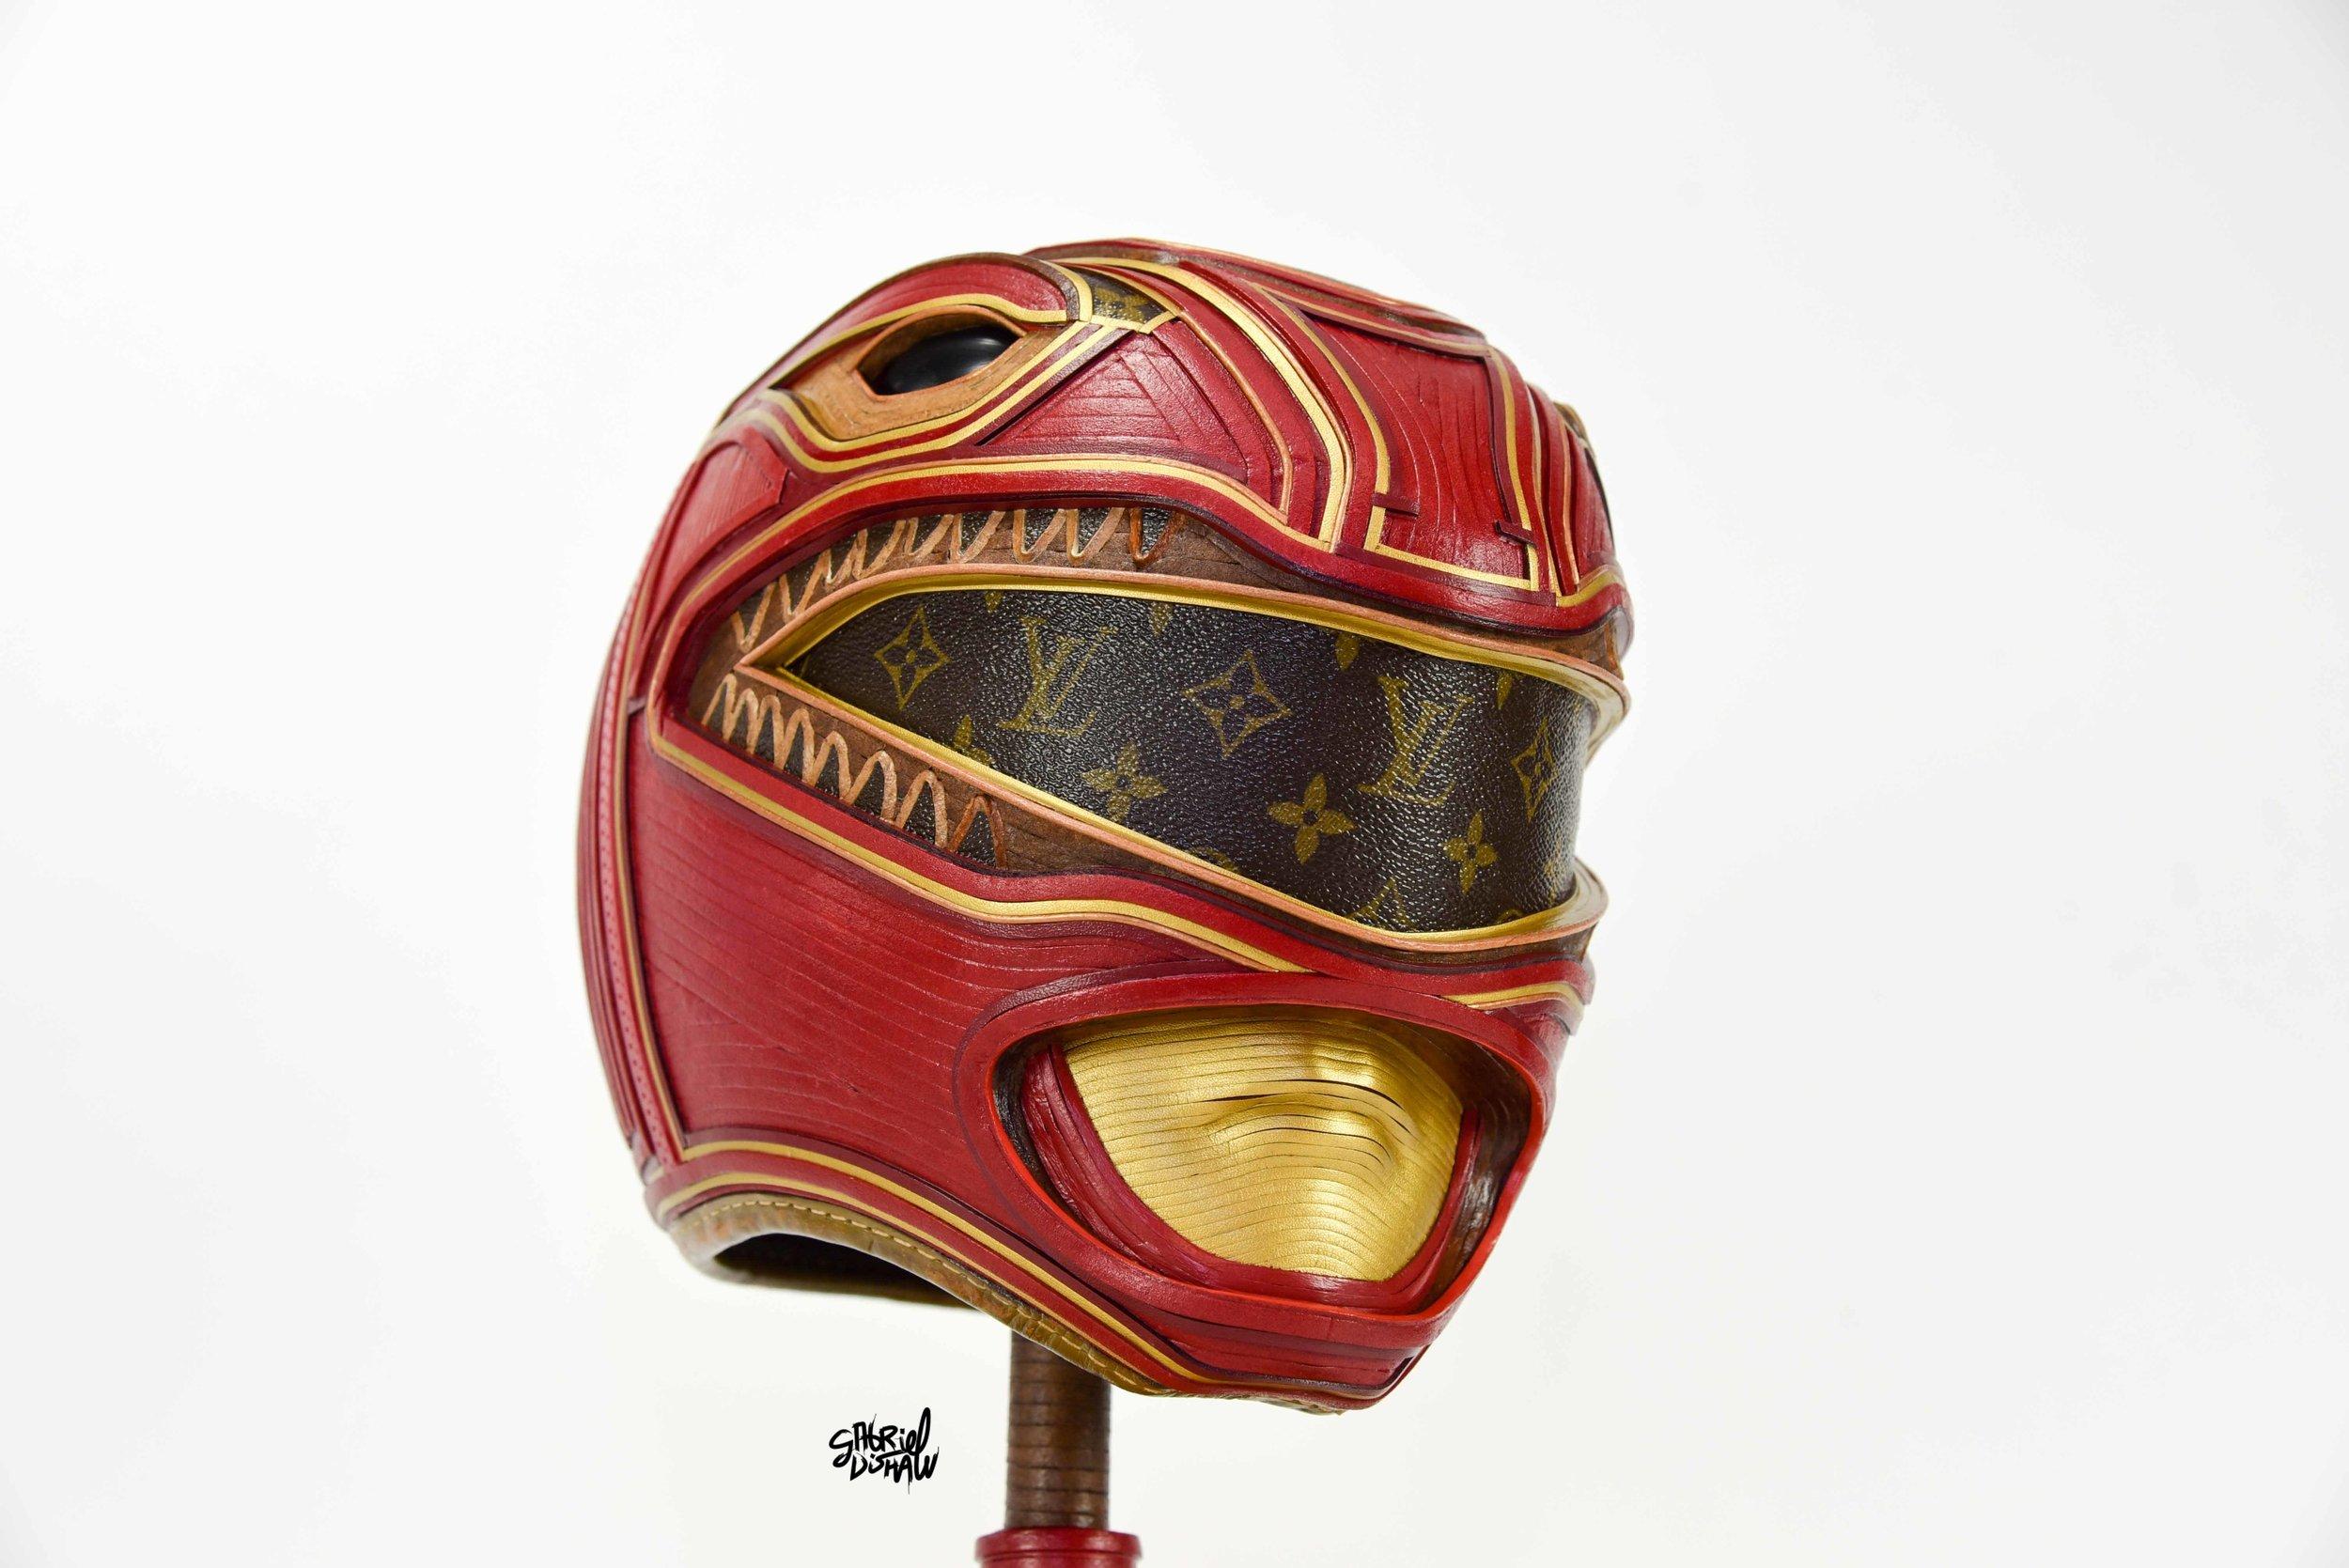 Gabriel Dishaw LV Red Ranger-3282.jpg